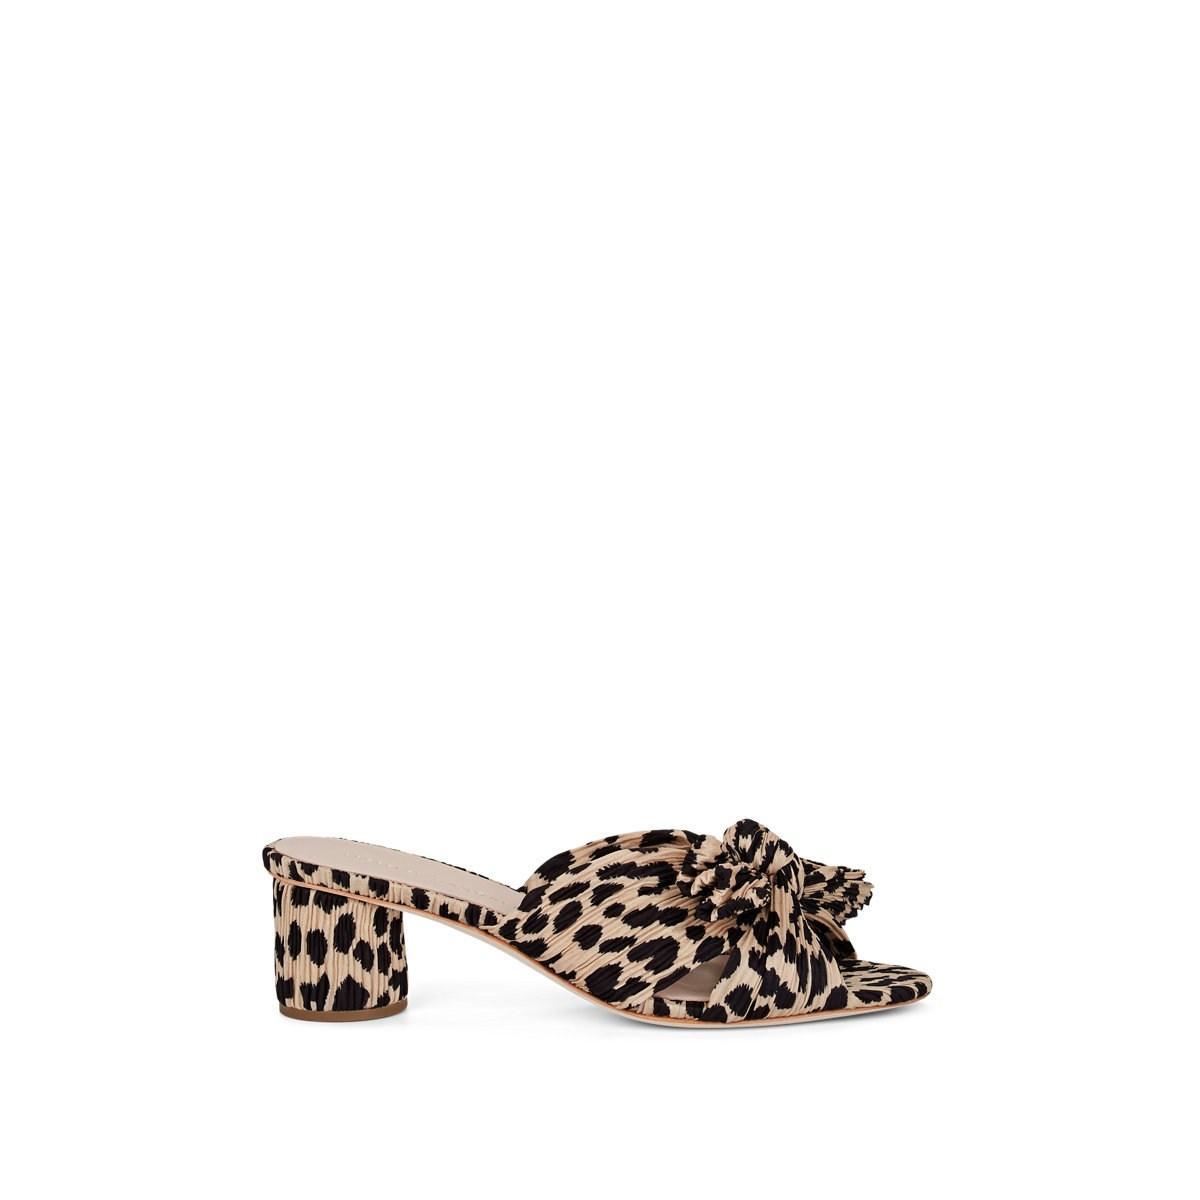 d7425a86a98f Loeffler Randall. Women's Natural Emilia Leopard-print Pleated Lamé Mules